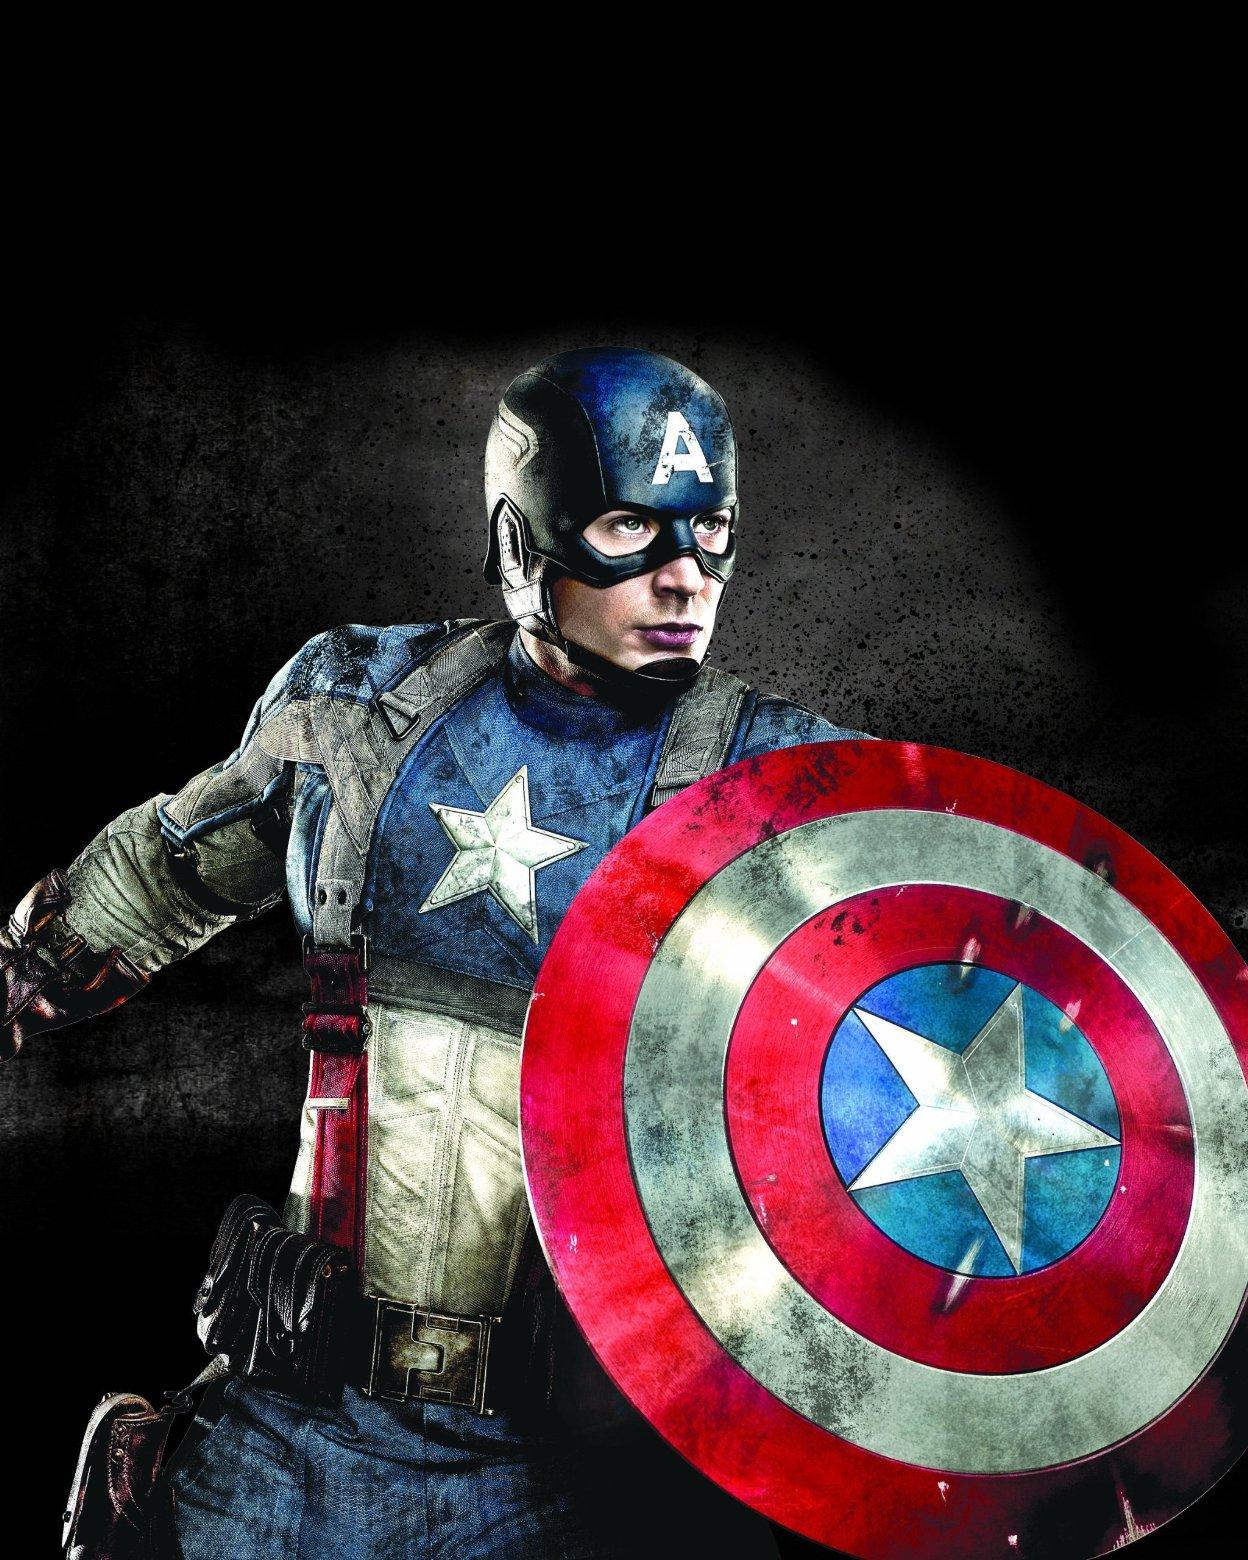 captain america superhero pictures. Black Bedroom Furniture Sets. Home Design Ideas